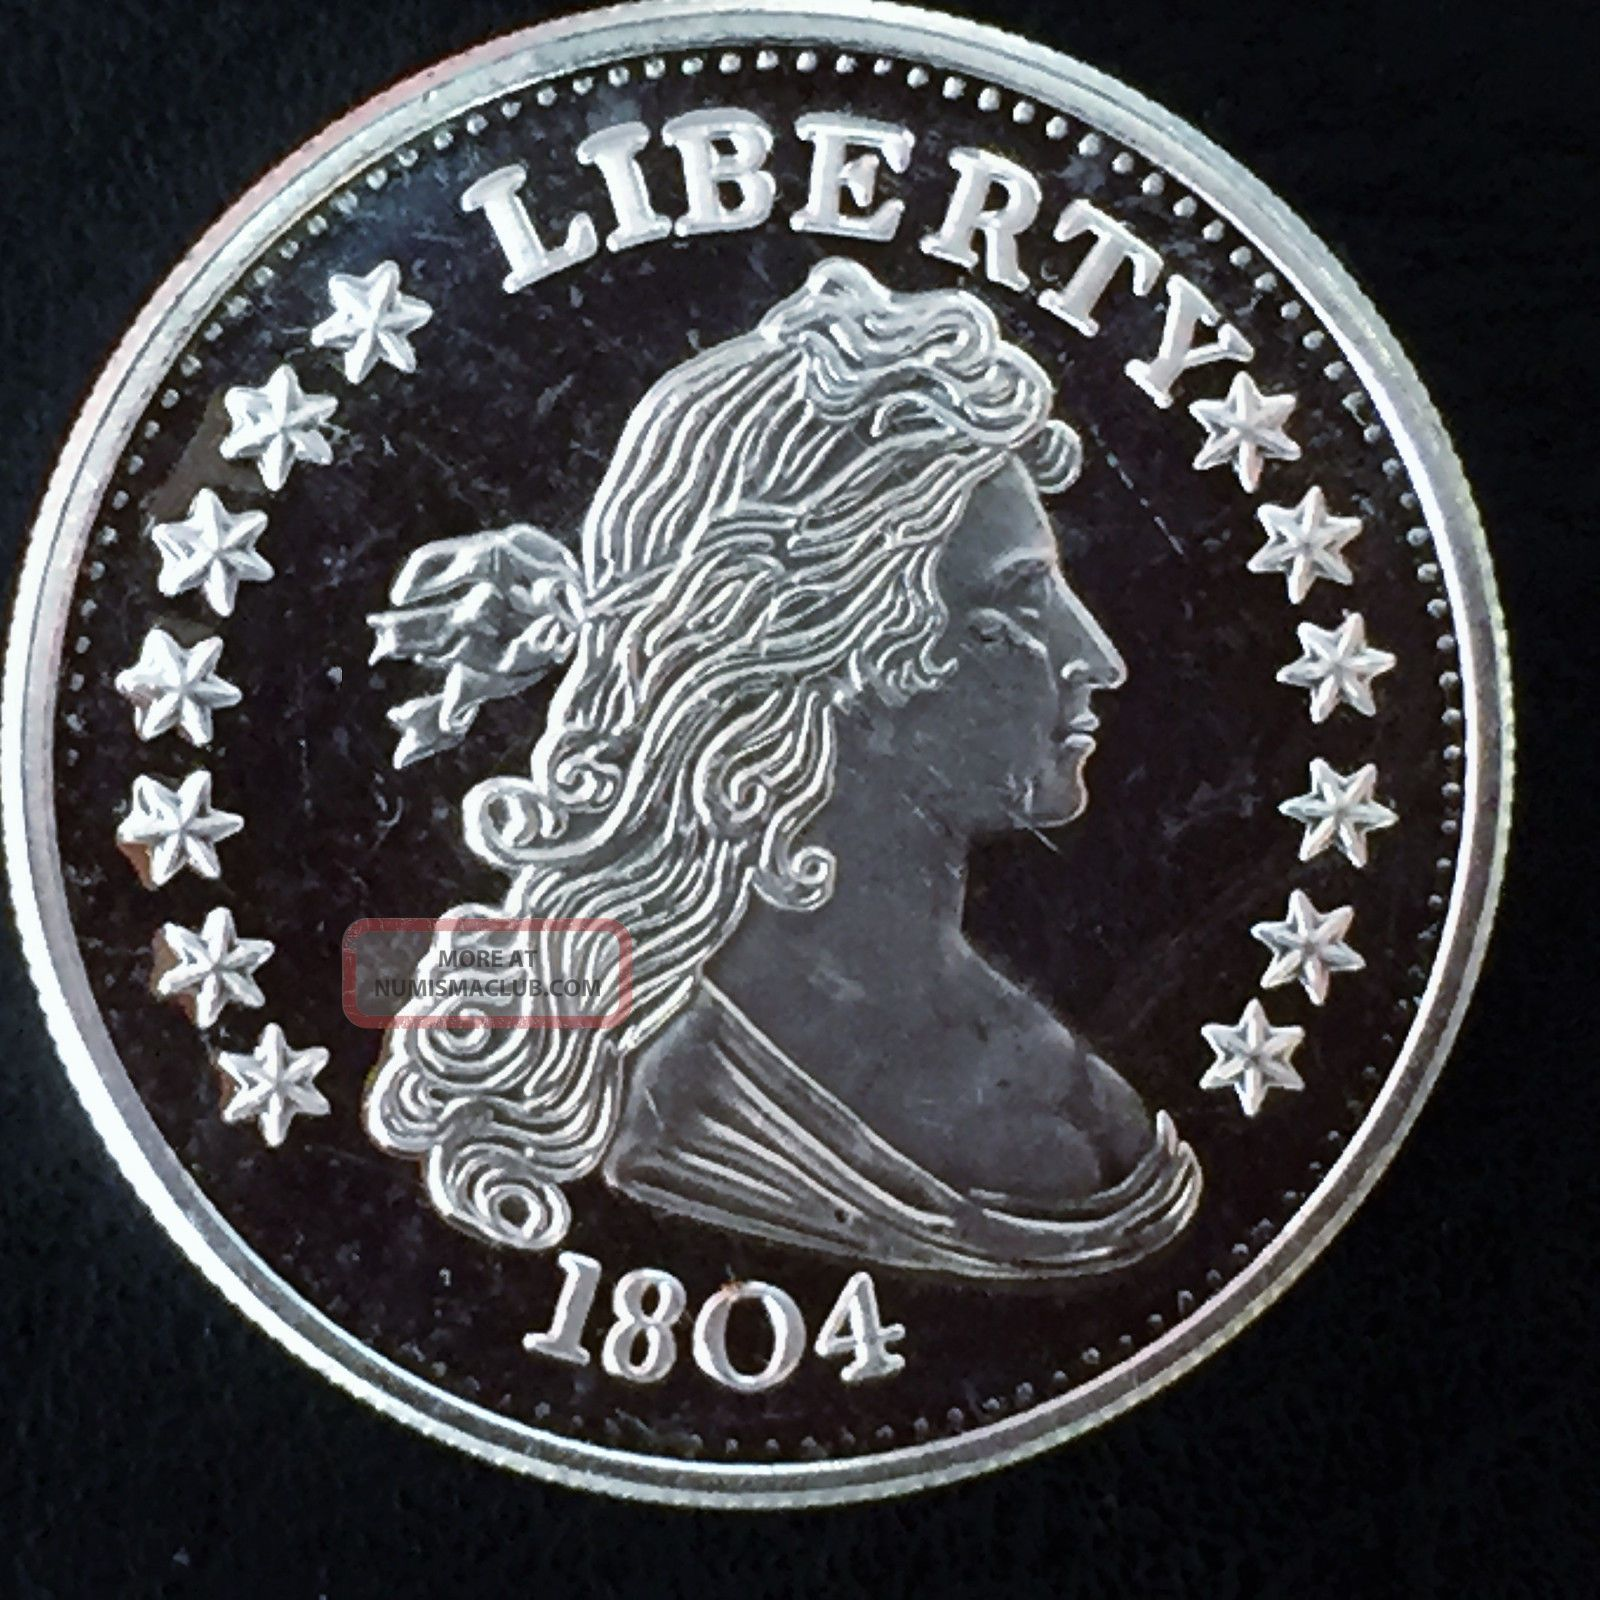 Liberty 1804 Bust Dollar Design Quot Copy Quot 1 Troy Oz 999